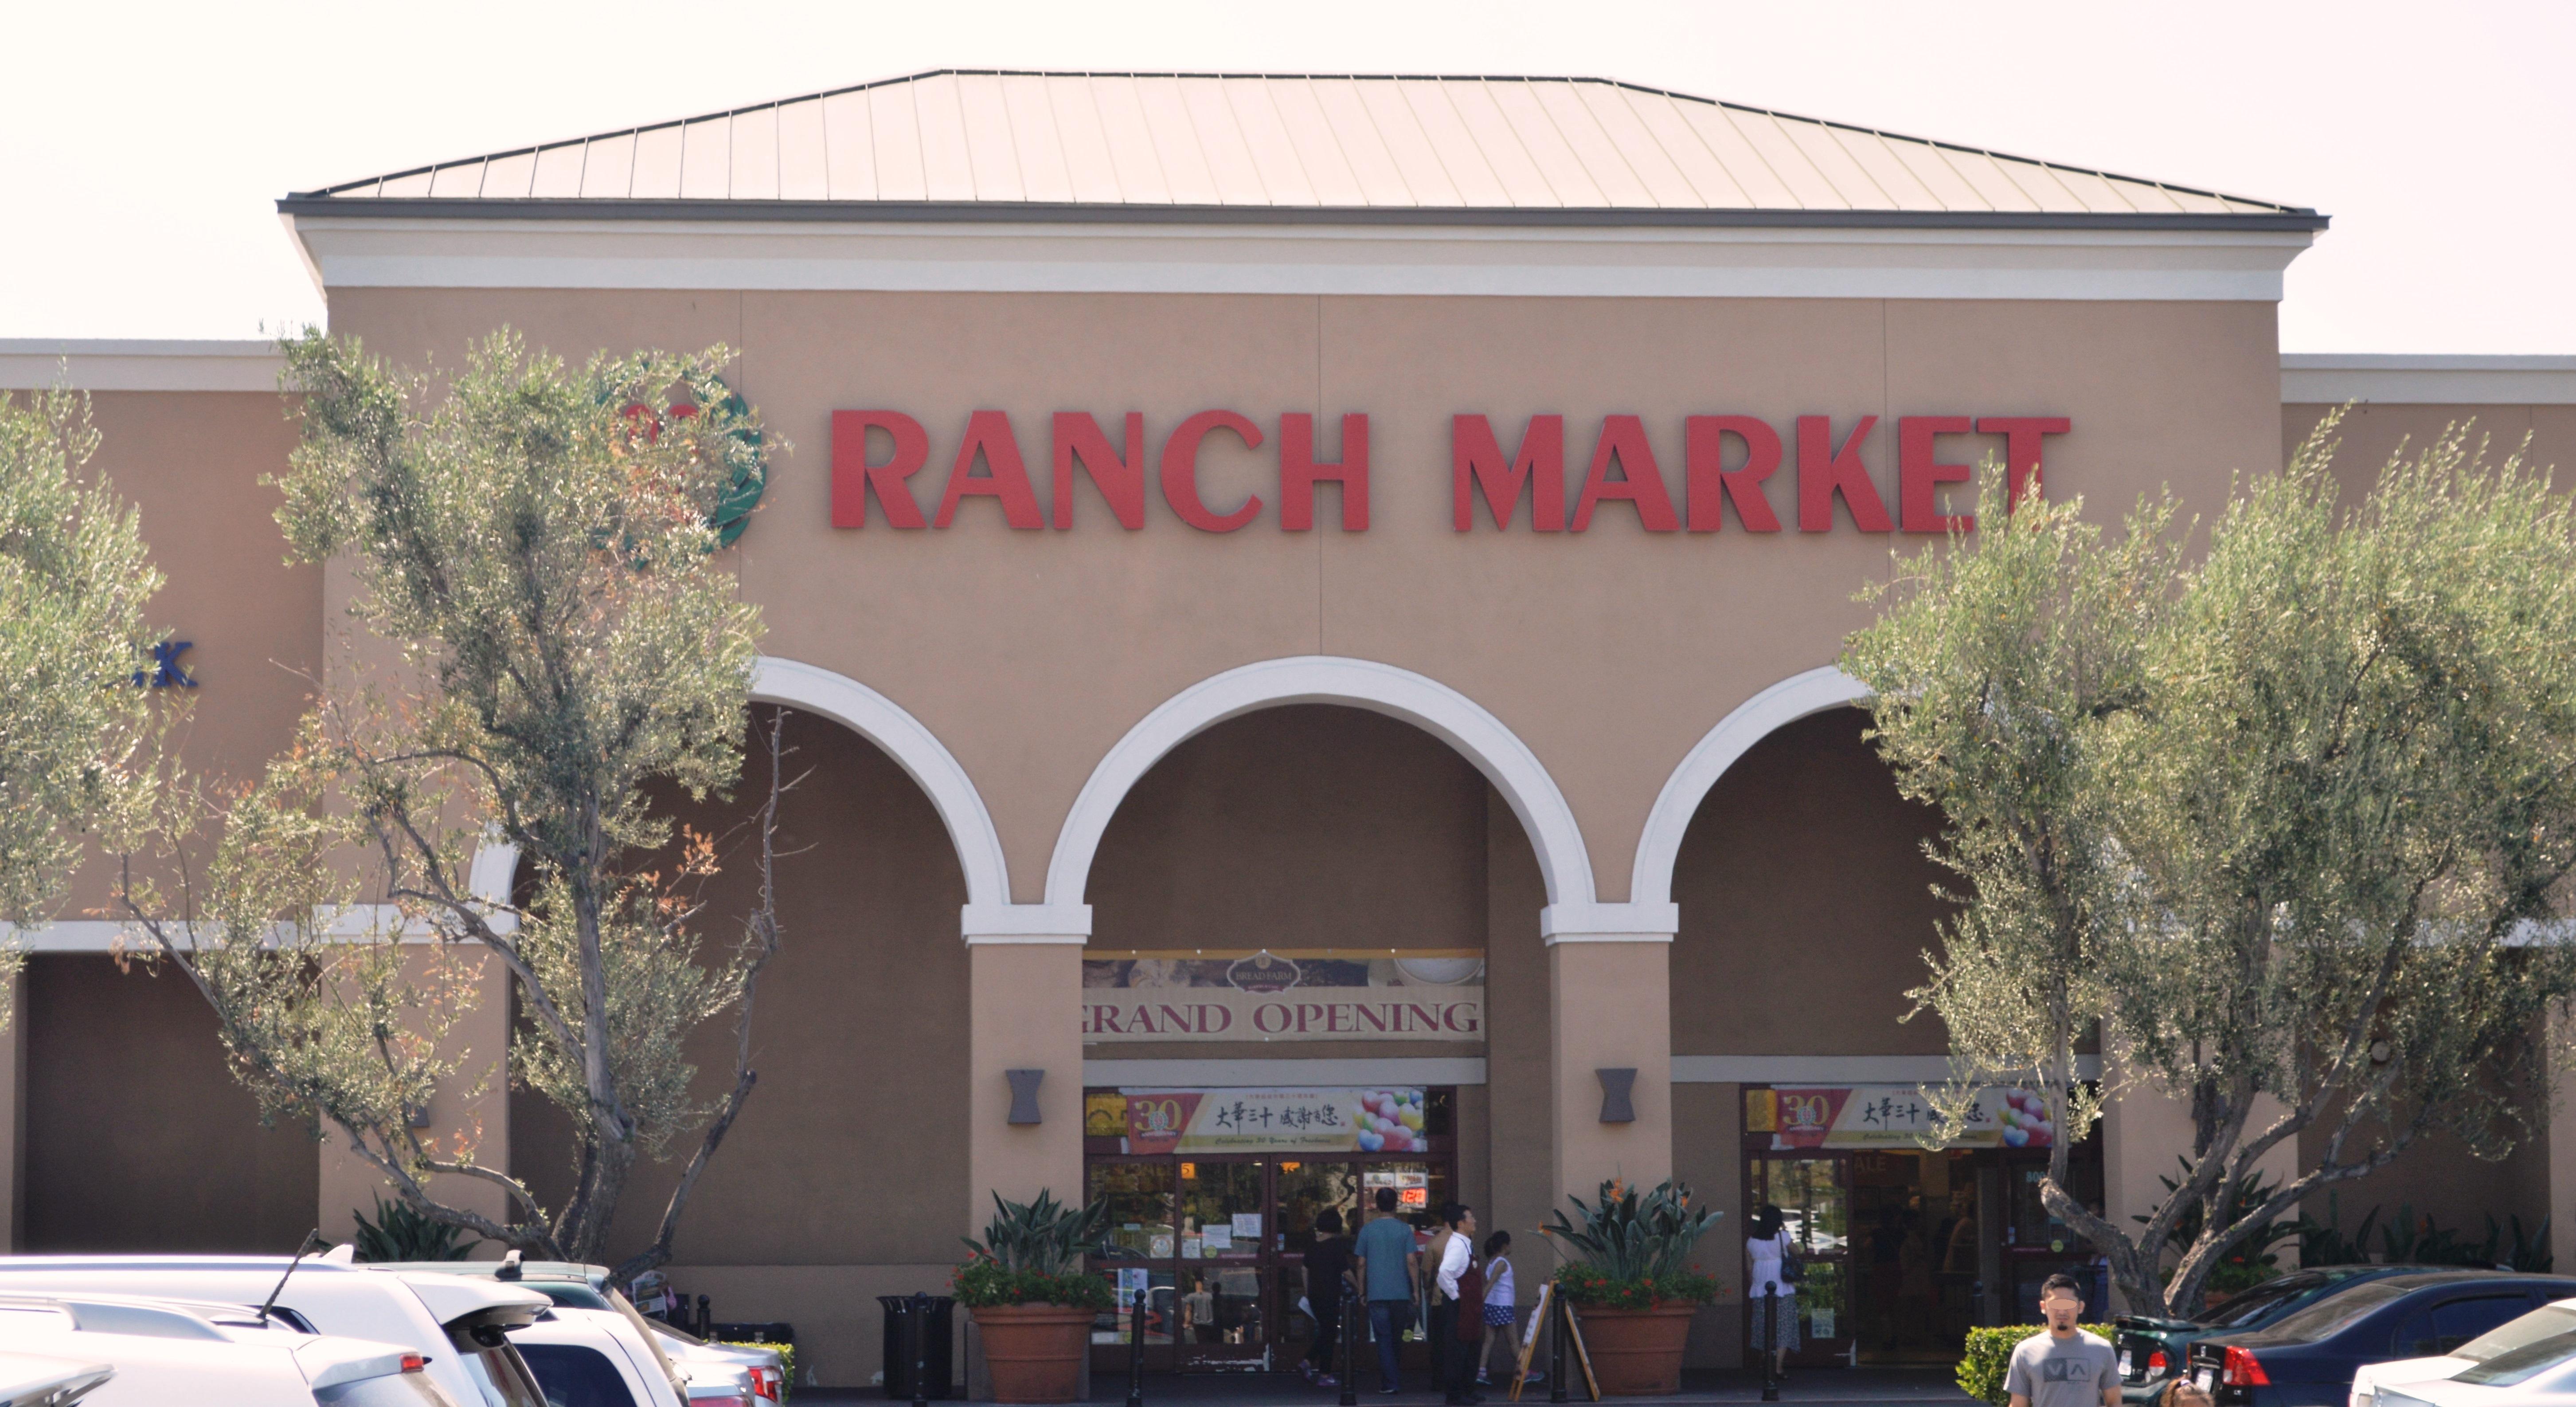 File20140809 0089 Irvine 99 Ranch Market CulverJPG